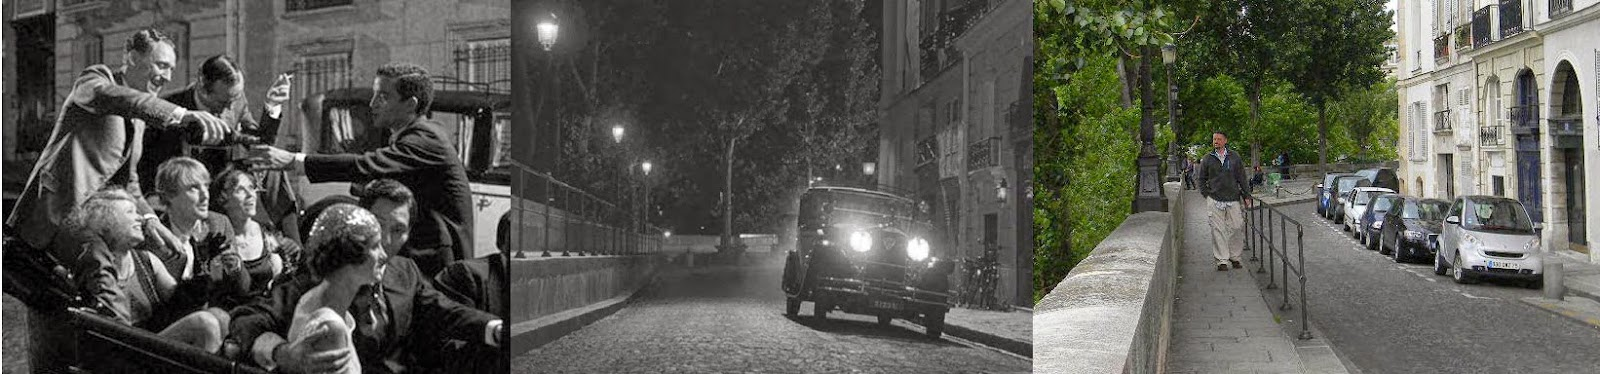 El Par�s del cine: Midnight in Paris | Haizea Urkiola